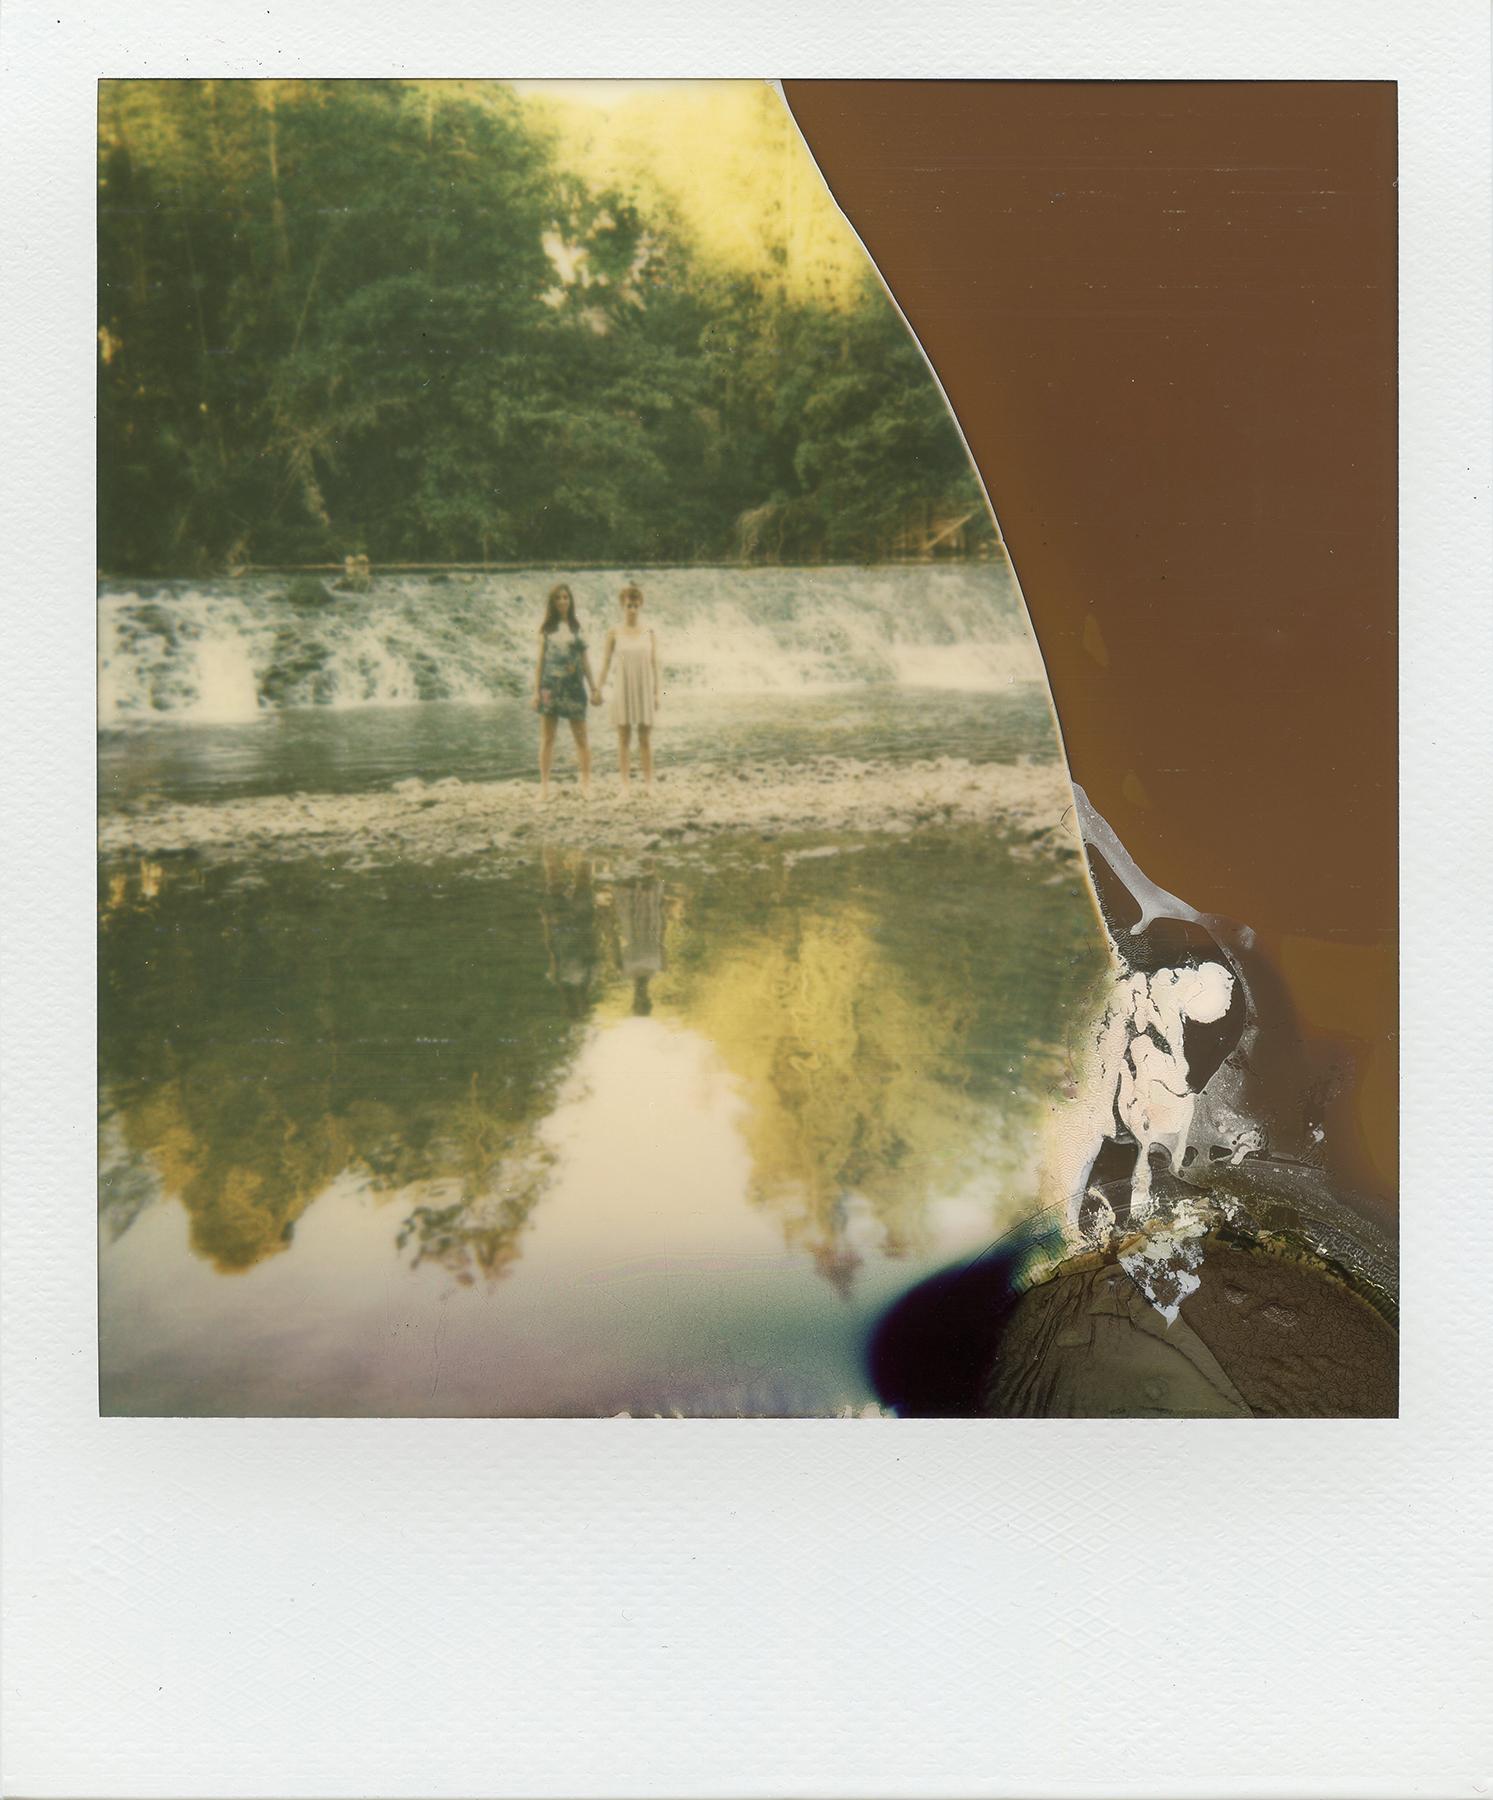 Lised and Psylvia | Polaroid Impulse | Impossible Color | La Fille Renne